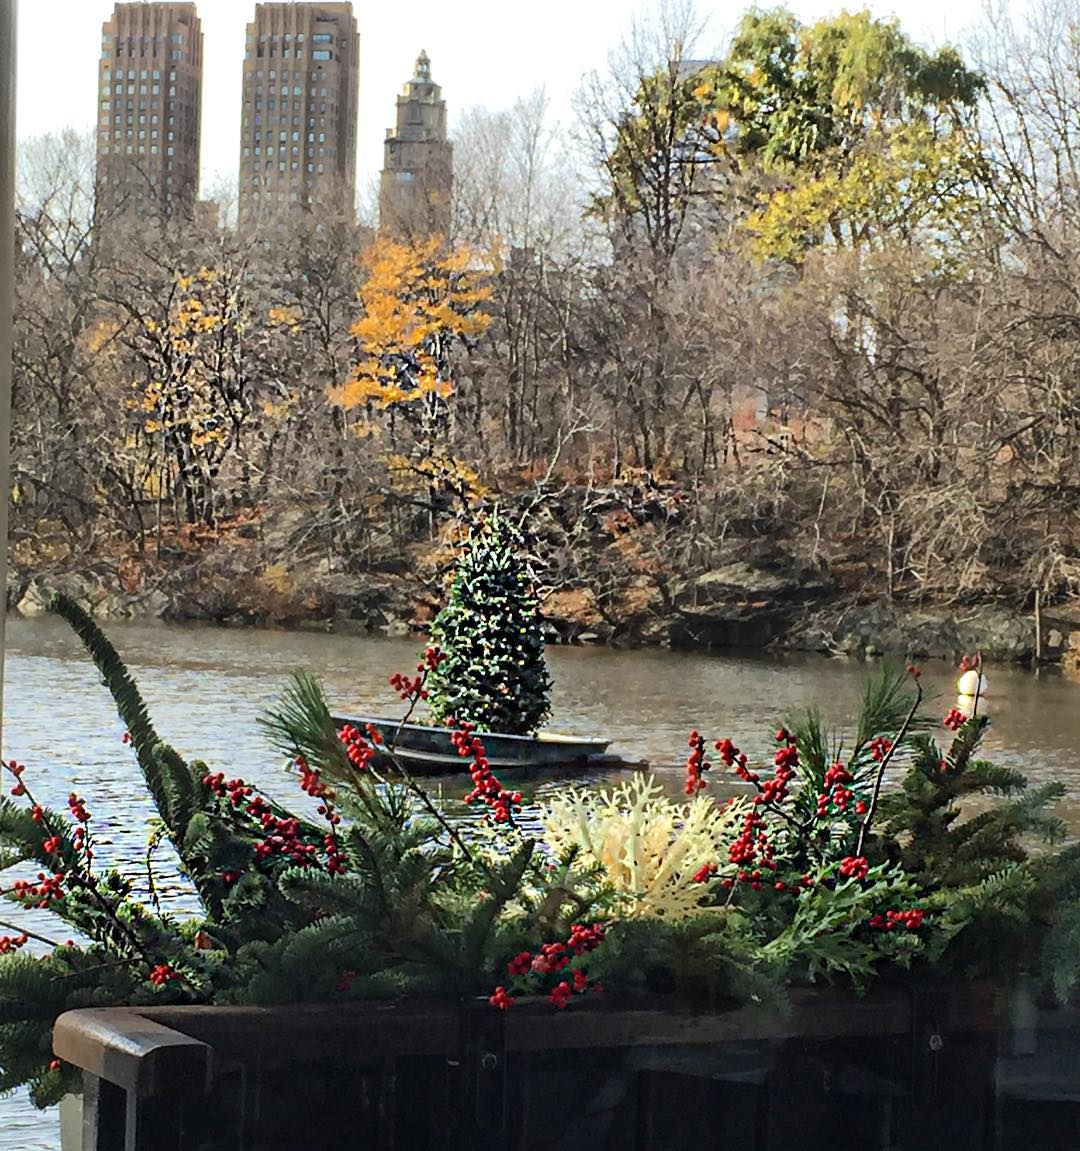 Boathouse Central Park